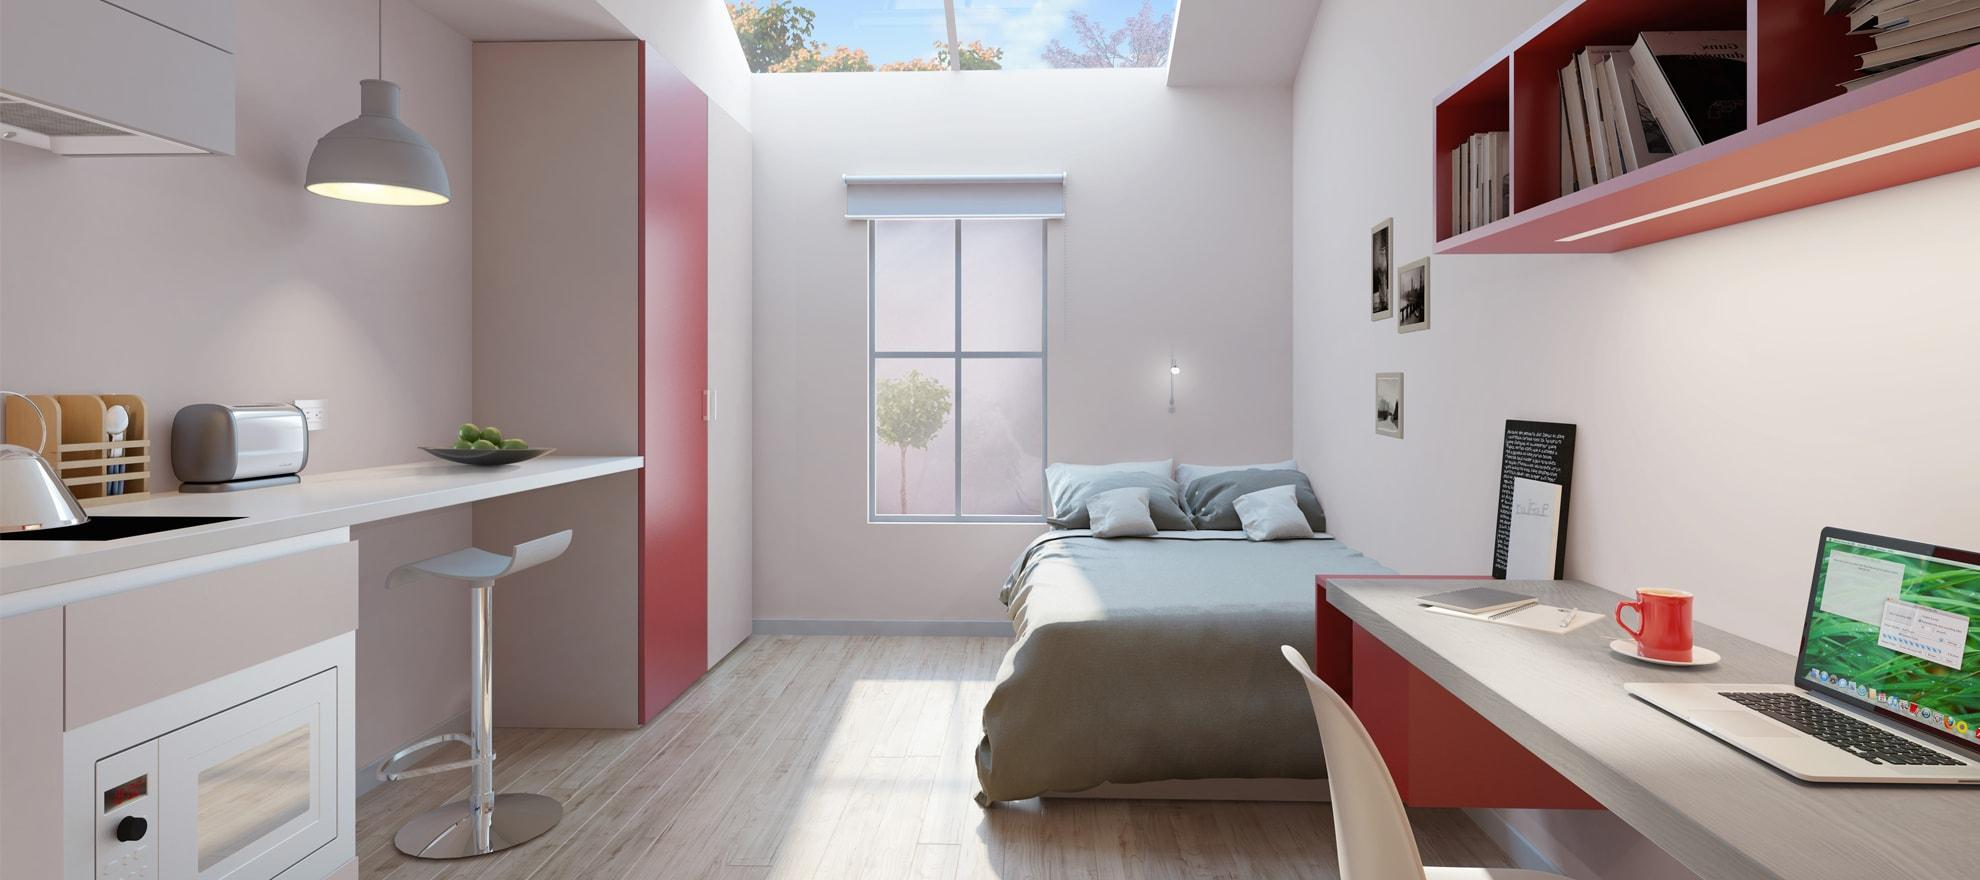 Podium-Egham-Studio-Bedroom 2-Unilodger